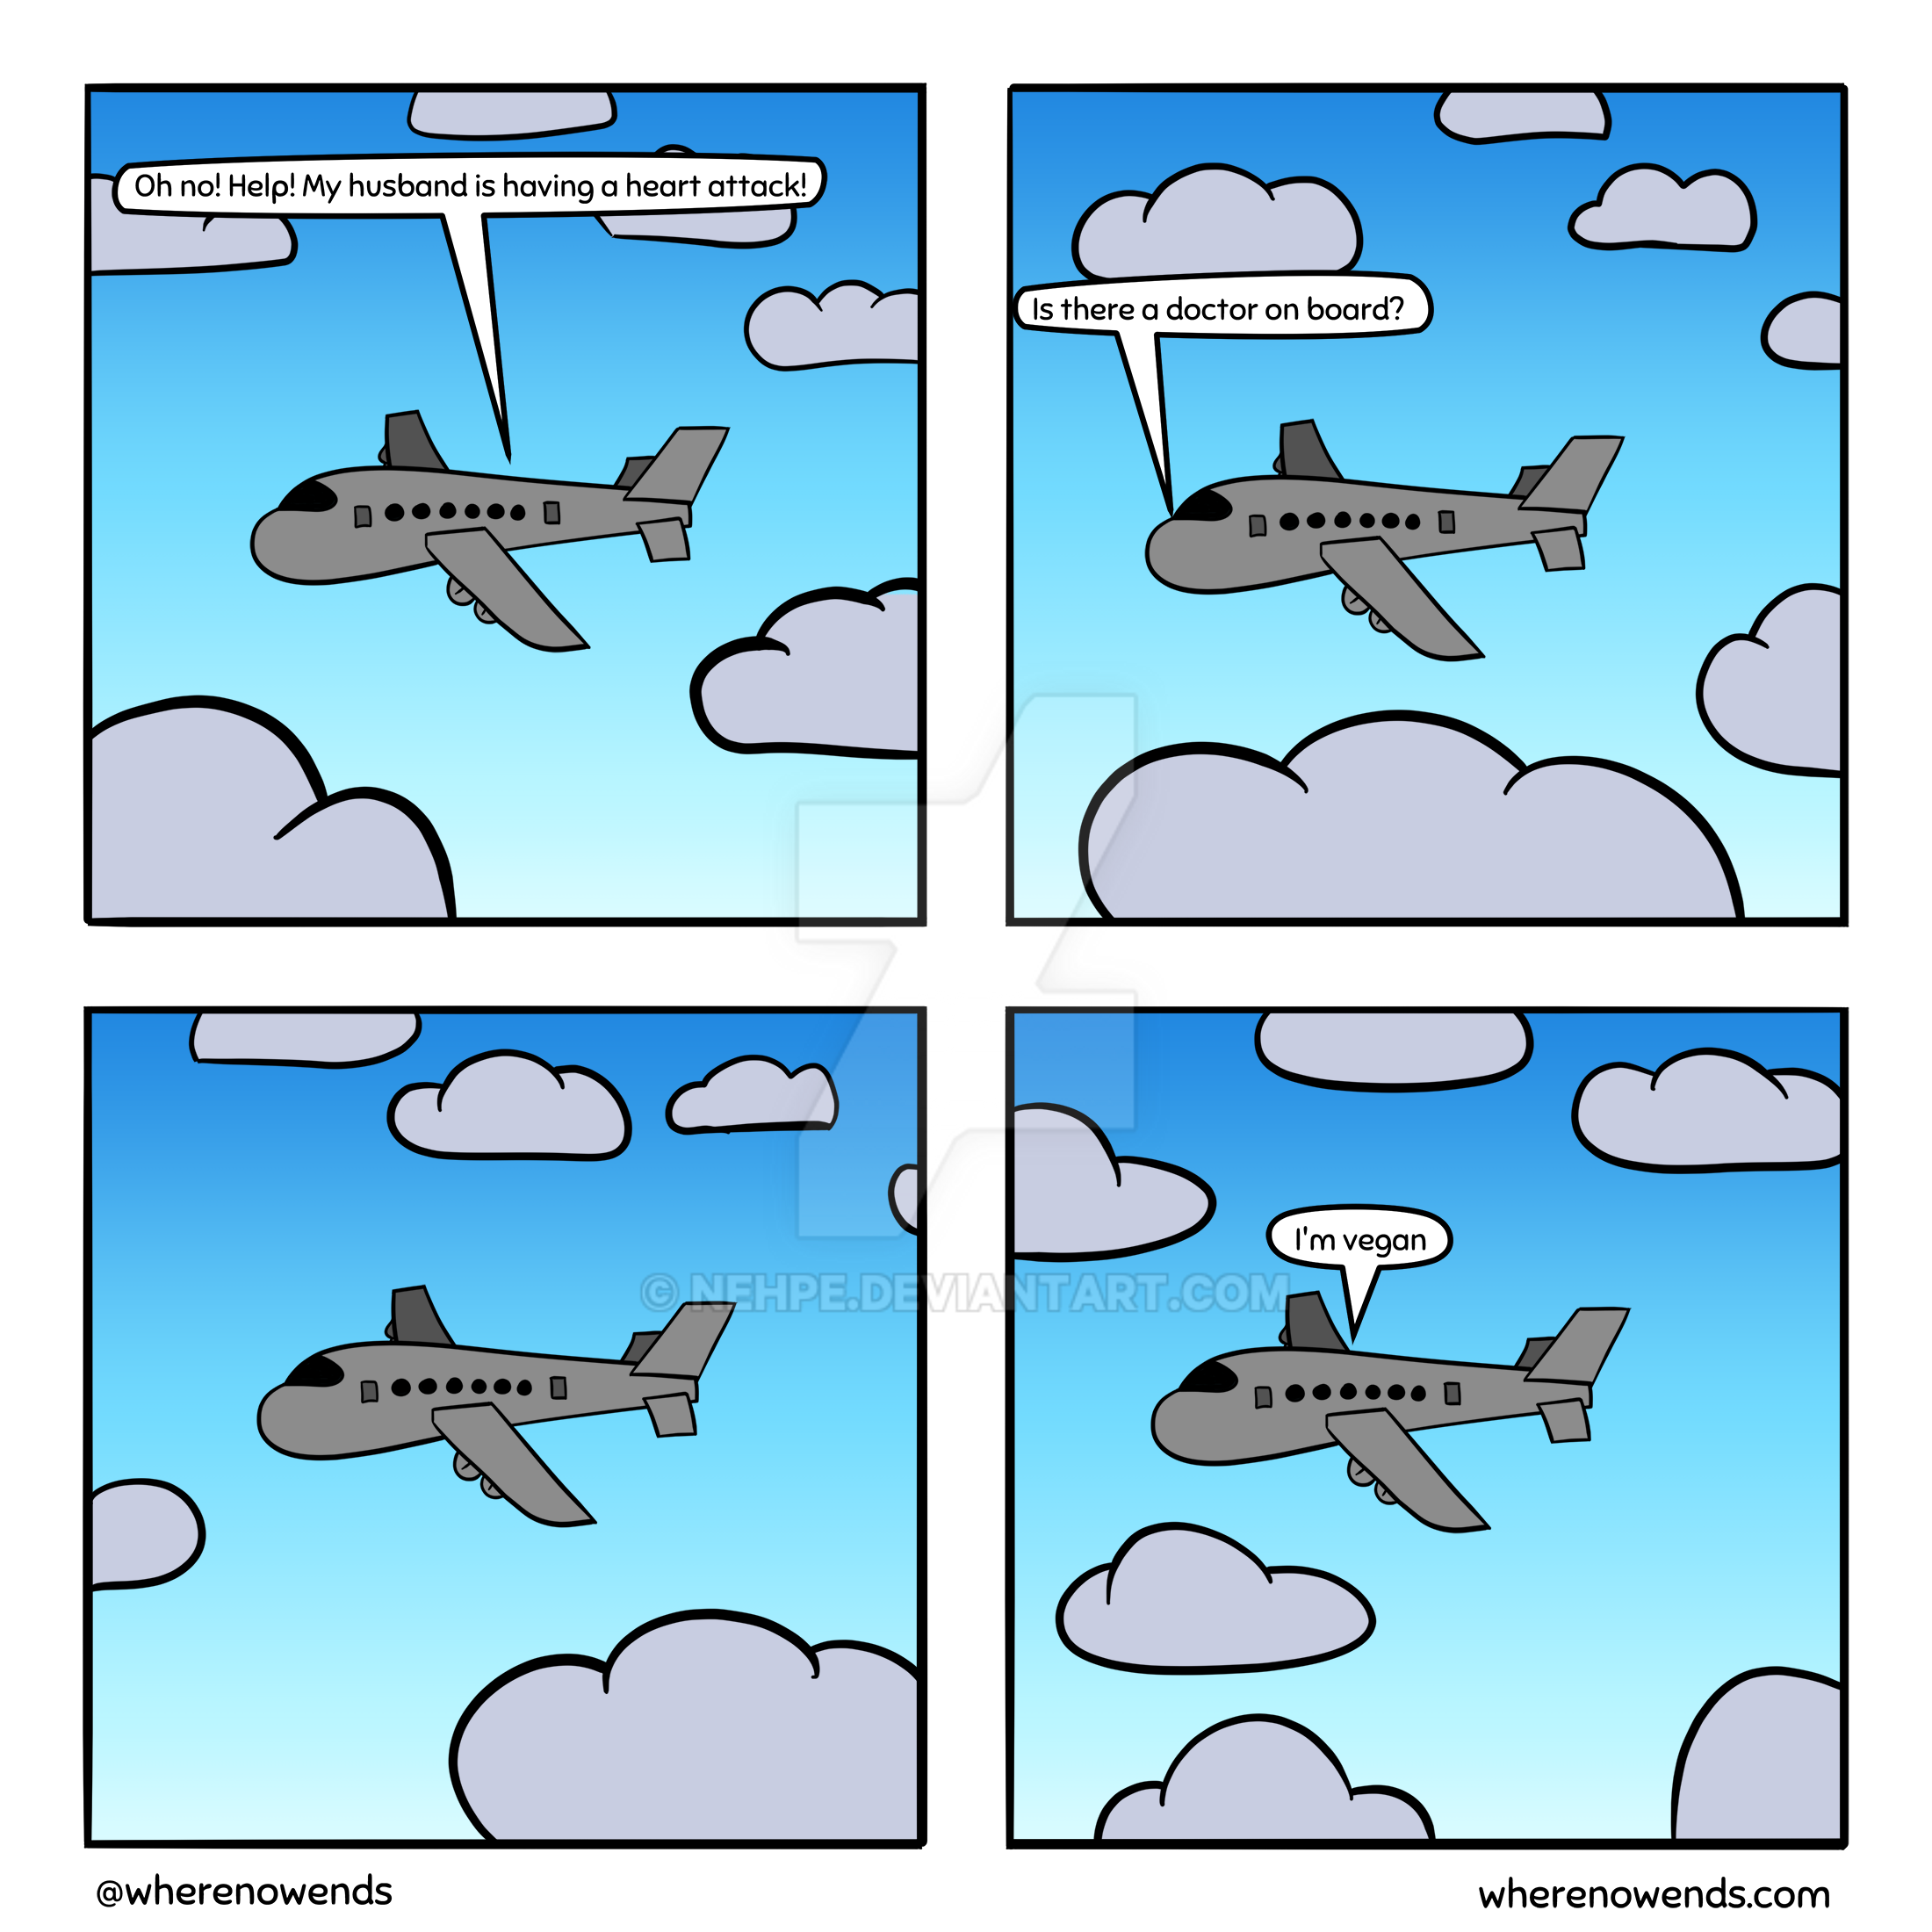 Plane by nehpe